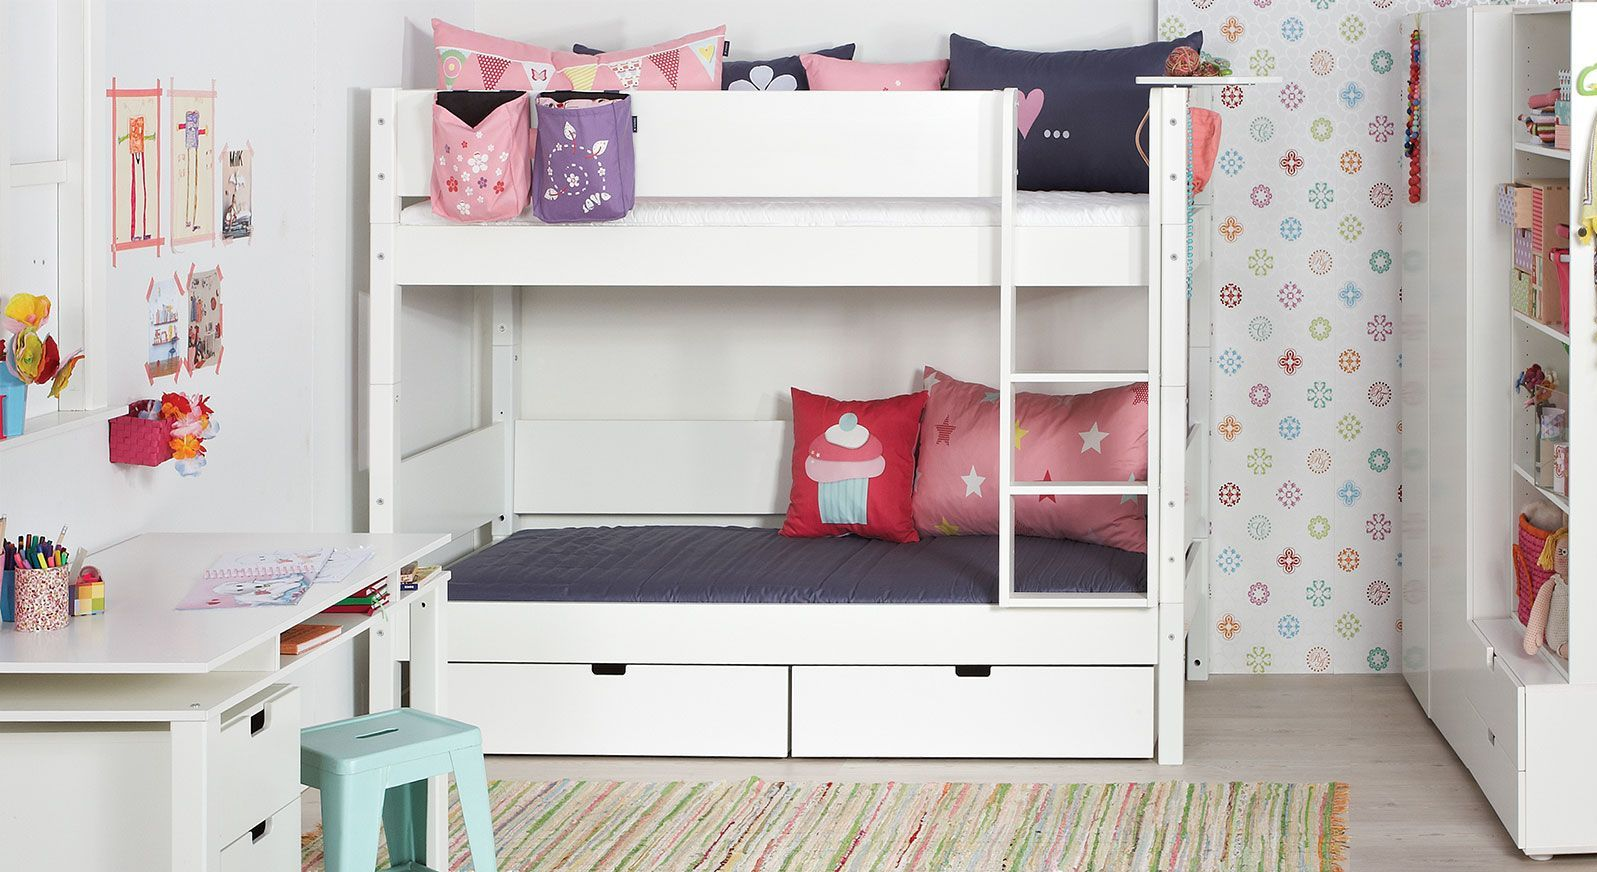 Etagenbett Angebot : Etagenbett kinderbett rose treppe links kaufen auf ricardo